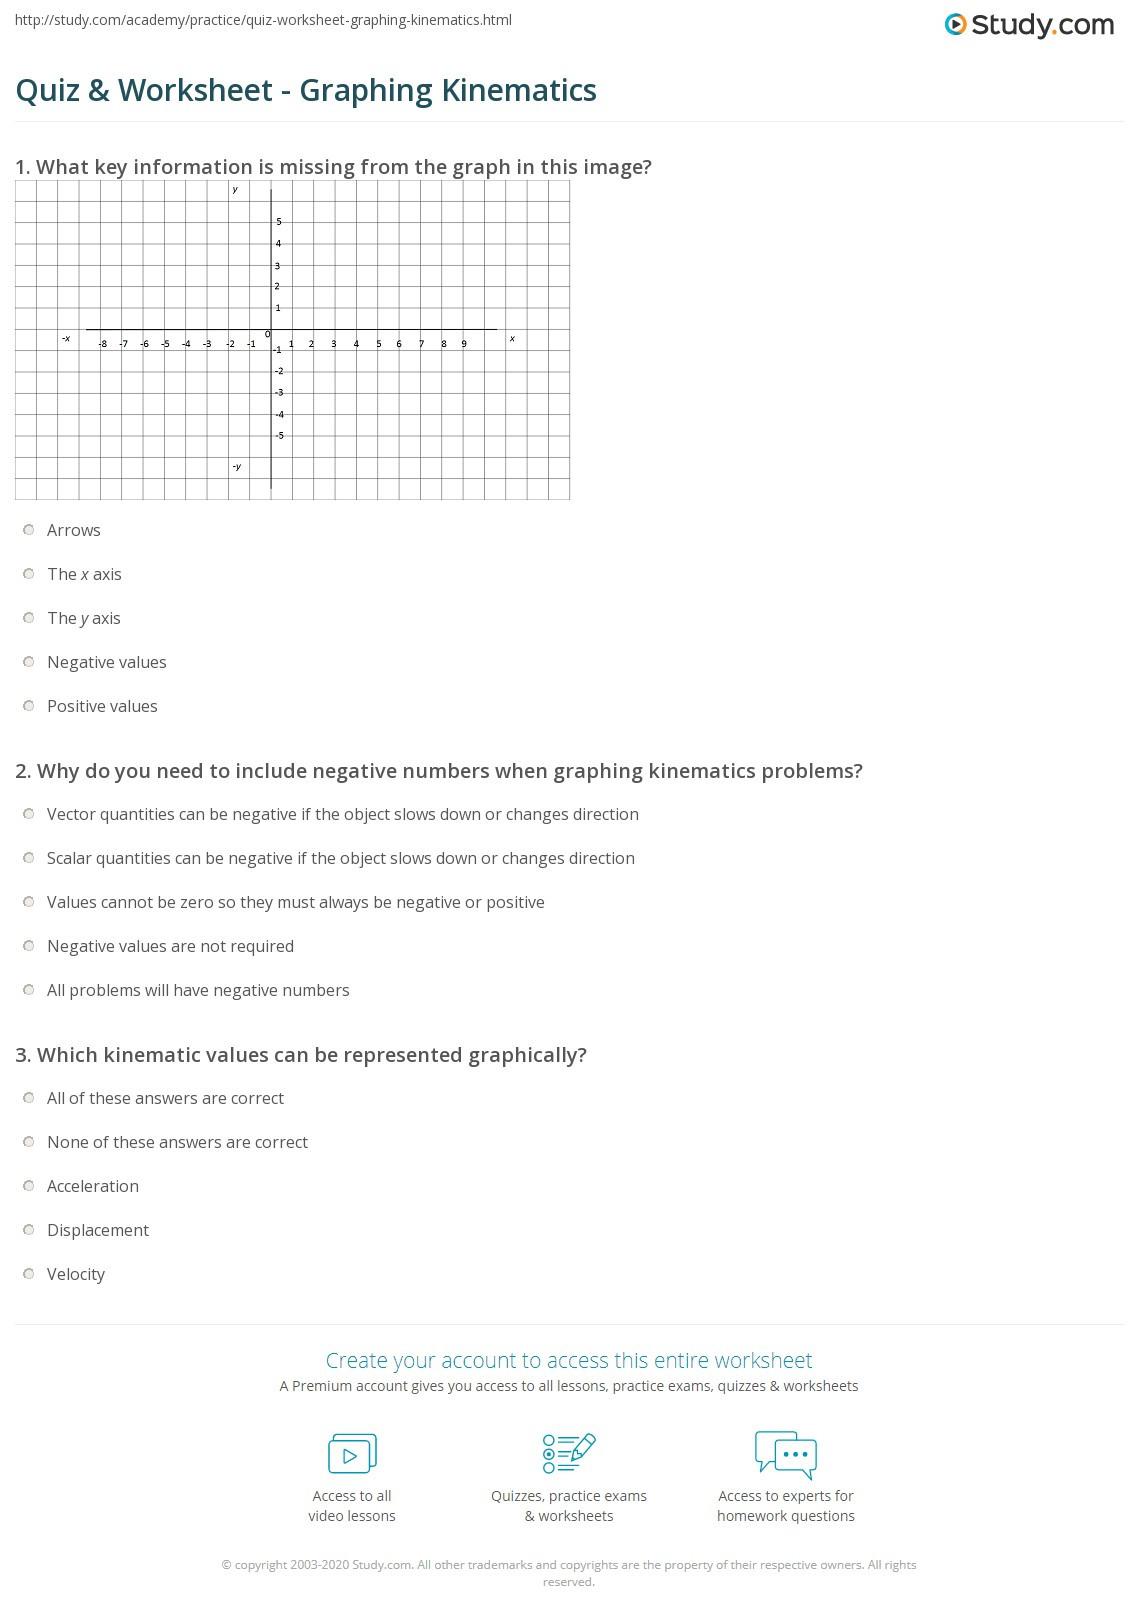 Motion Graphs Worksheet Answer Key Quiz & Worksheet Graphing Kinematics